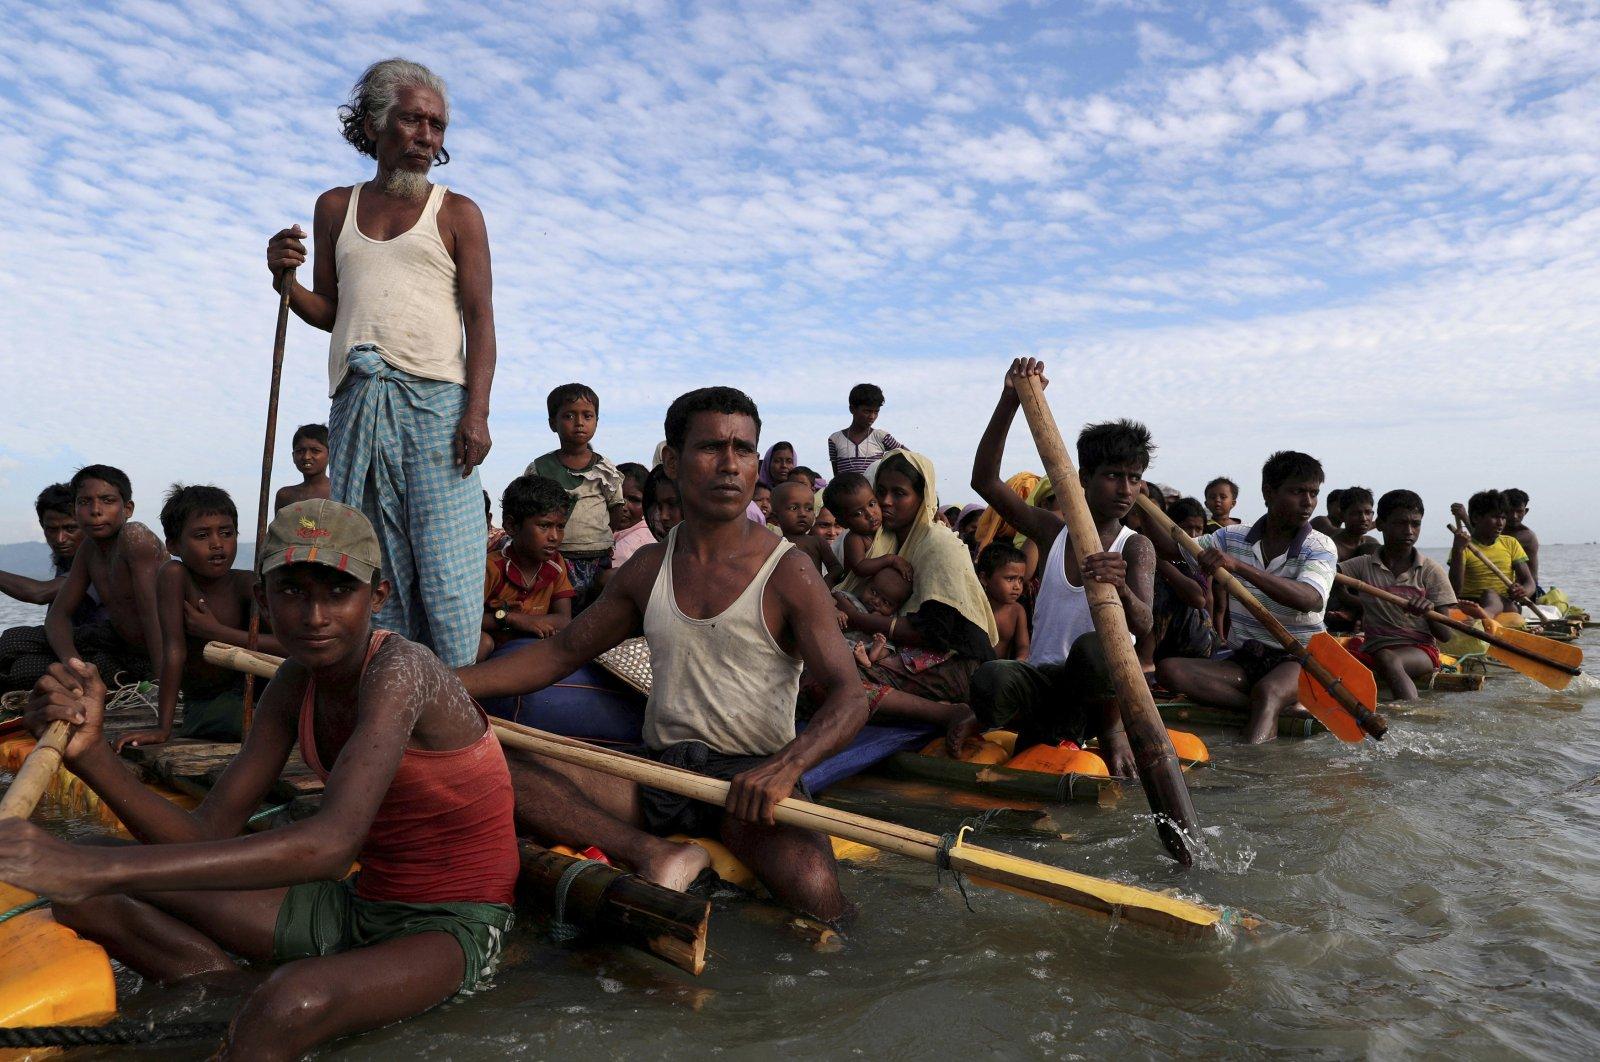 Rohingya refugees cross a river aboard a raft to reach Bangladesh, Teknaf, Bangladesh, Nov. 12, 2017. (REUTERS PHOTO)